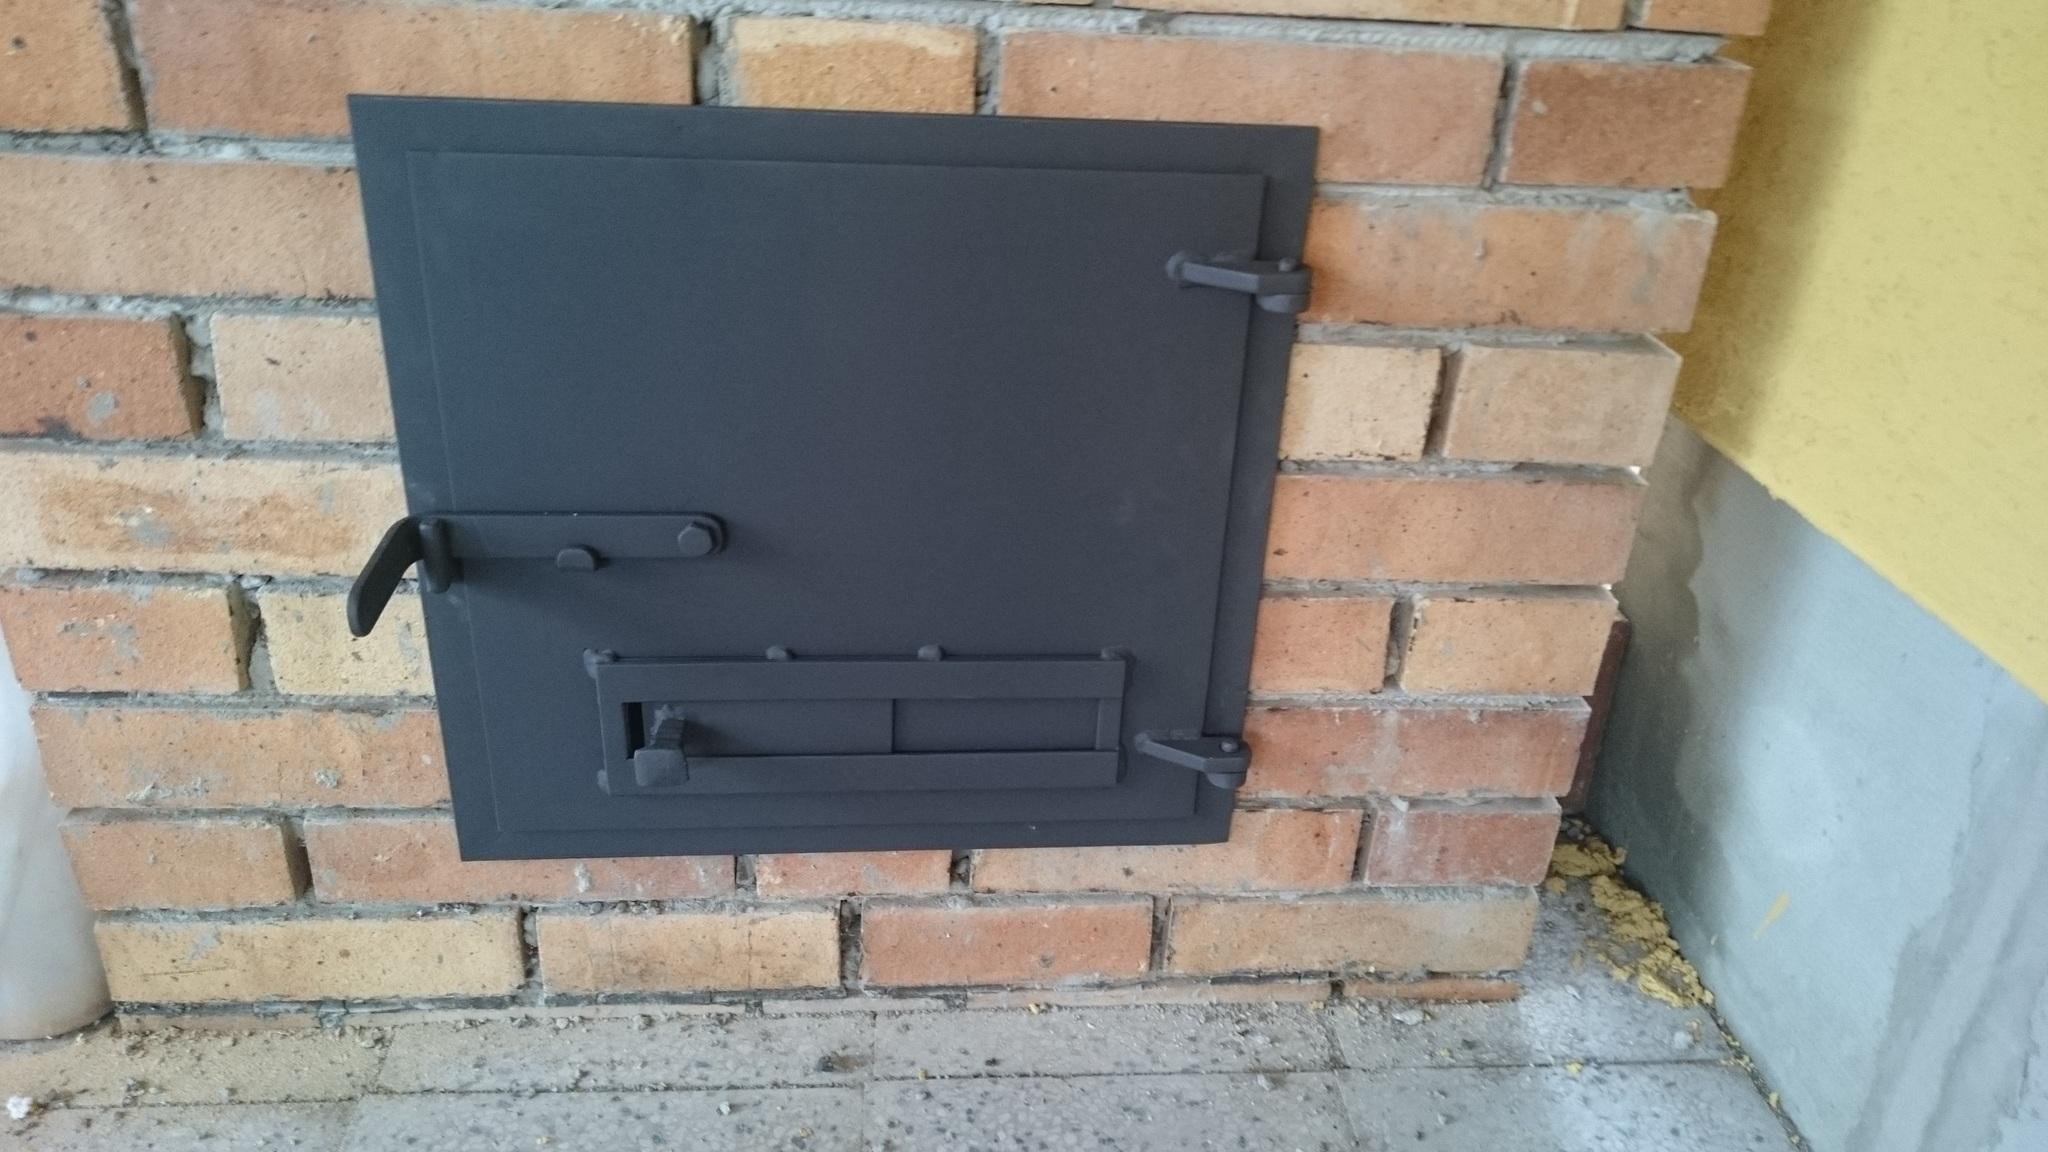 Tür zum Kamin, brennende Farbe